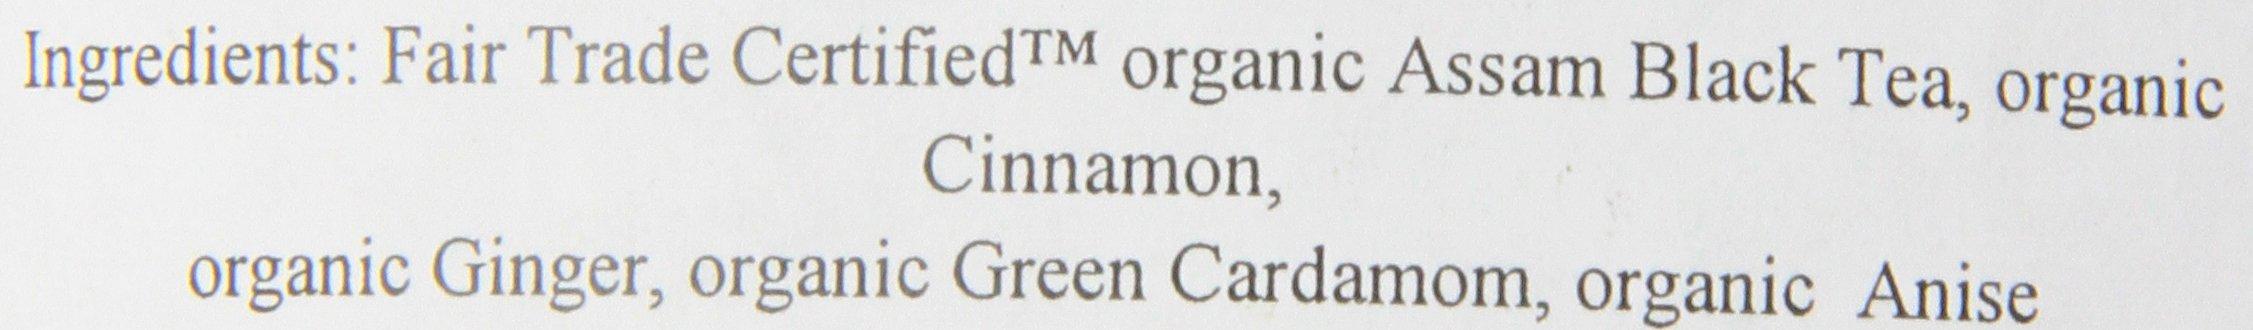 Numi Organic Tea Golden Chai, 16 Ounce Pouch (Pack of 6), Loose Leaf Black Tea by Numi Organic Tea (Image #2)